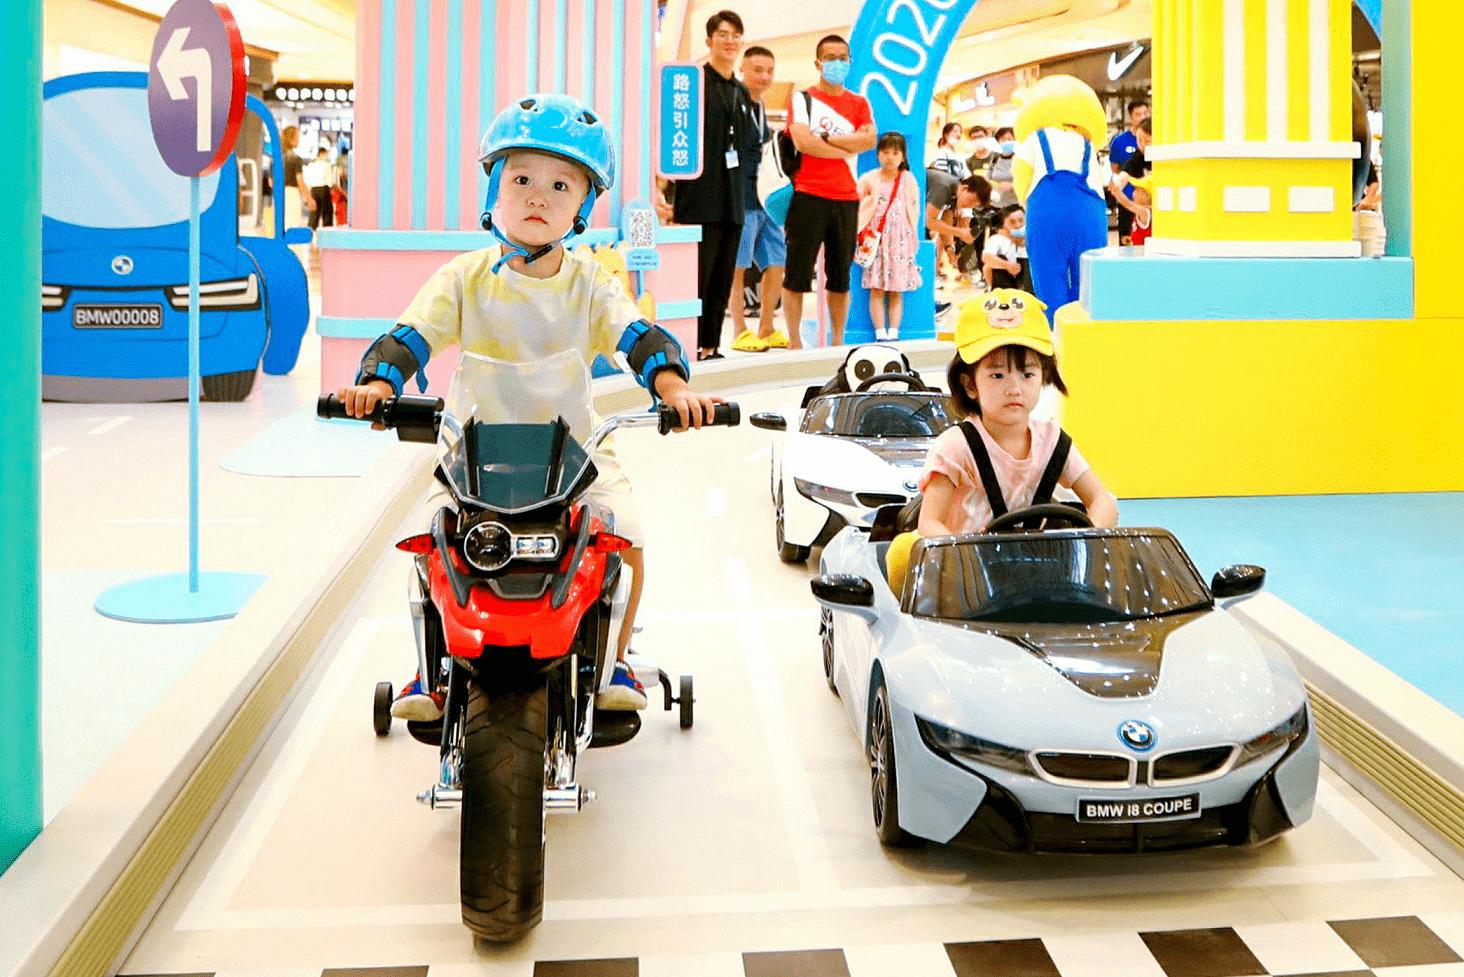 2020 BMW儿童交通安全训练营开学季快闪重庆